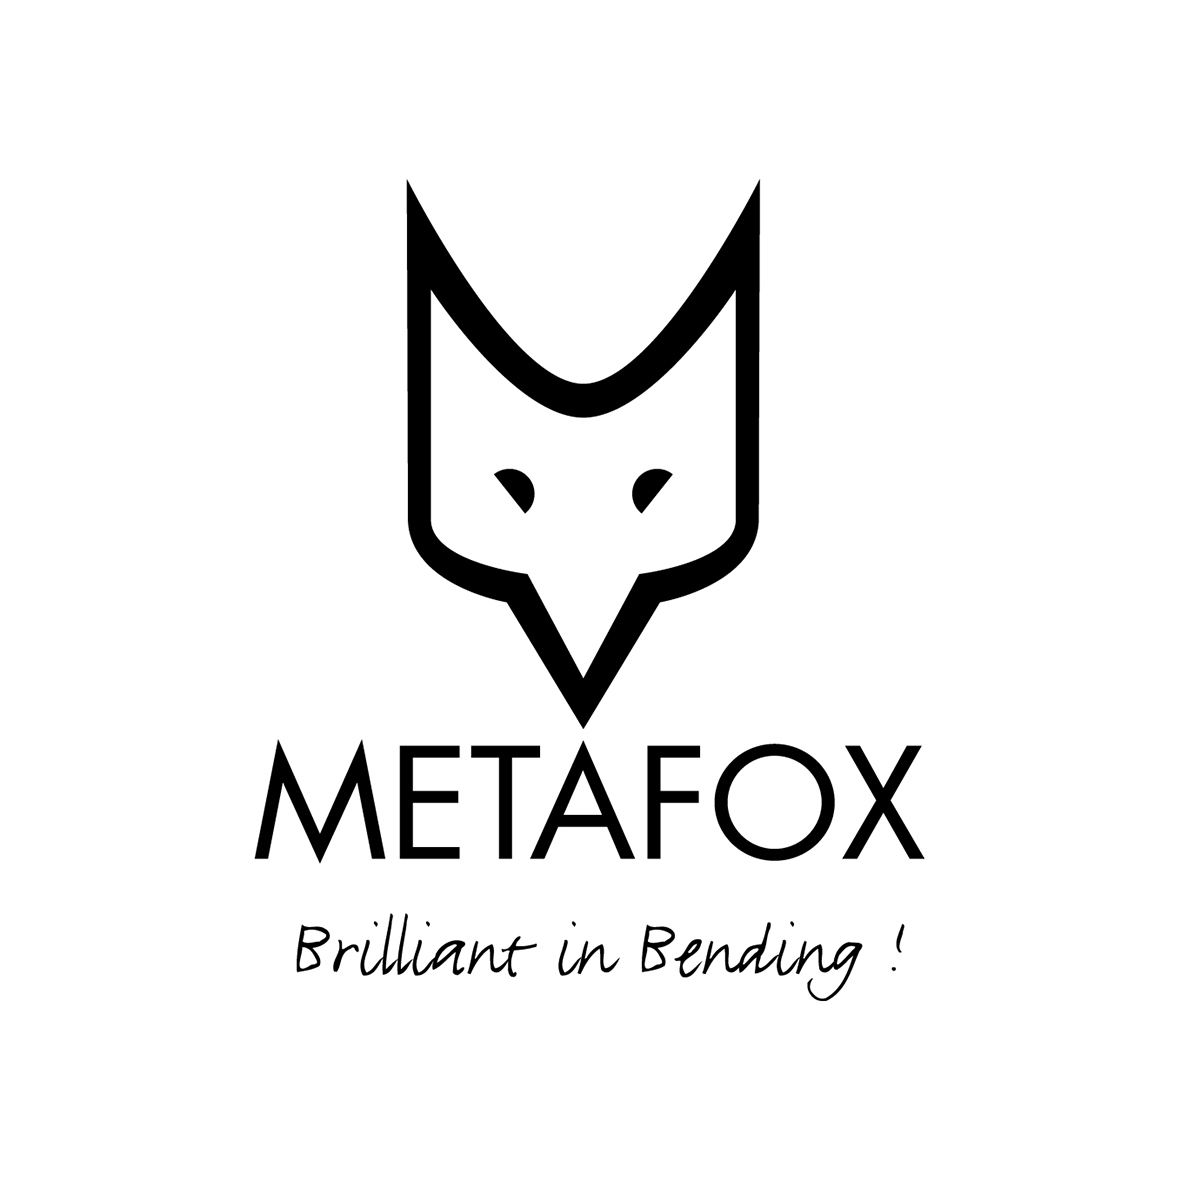 Metafox